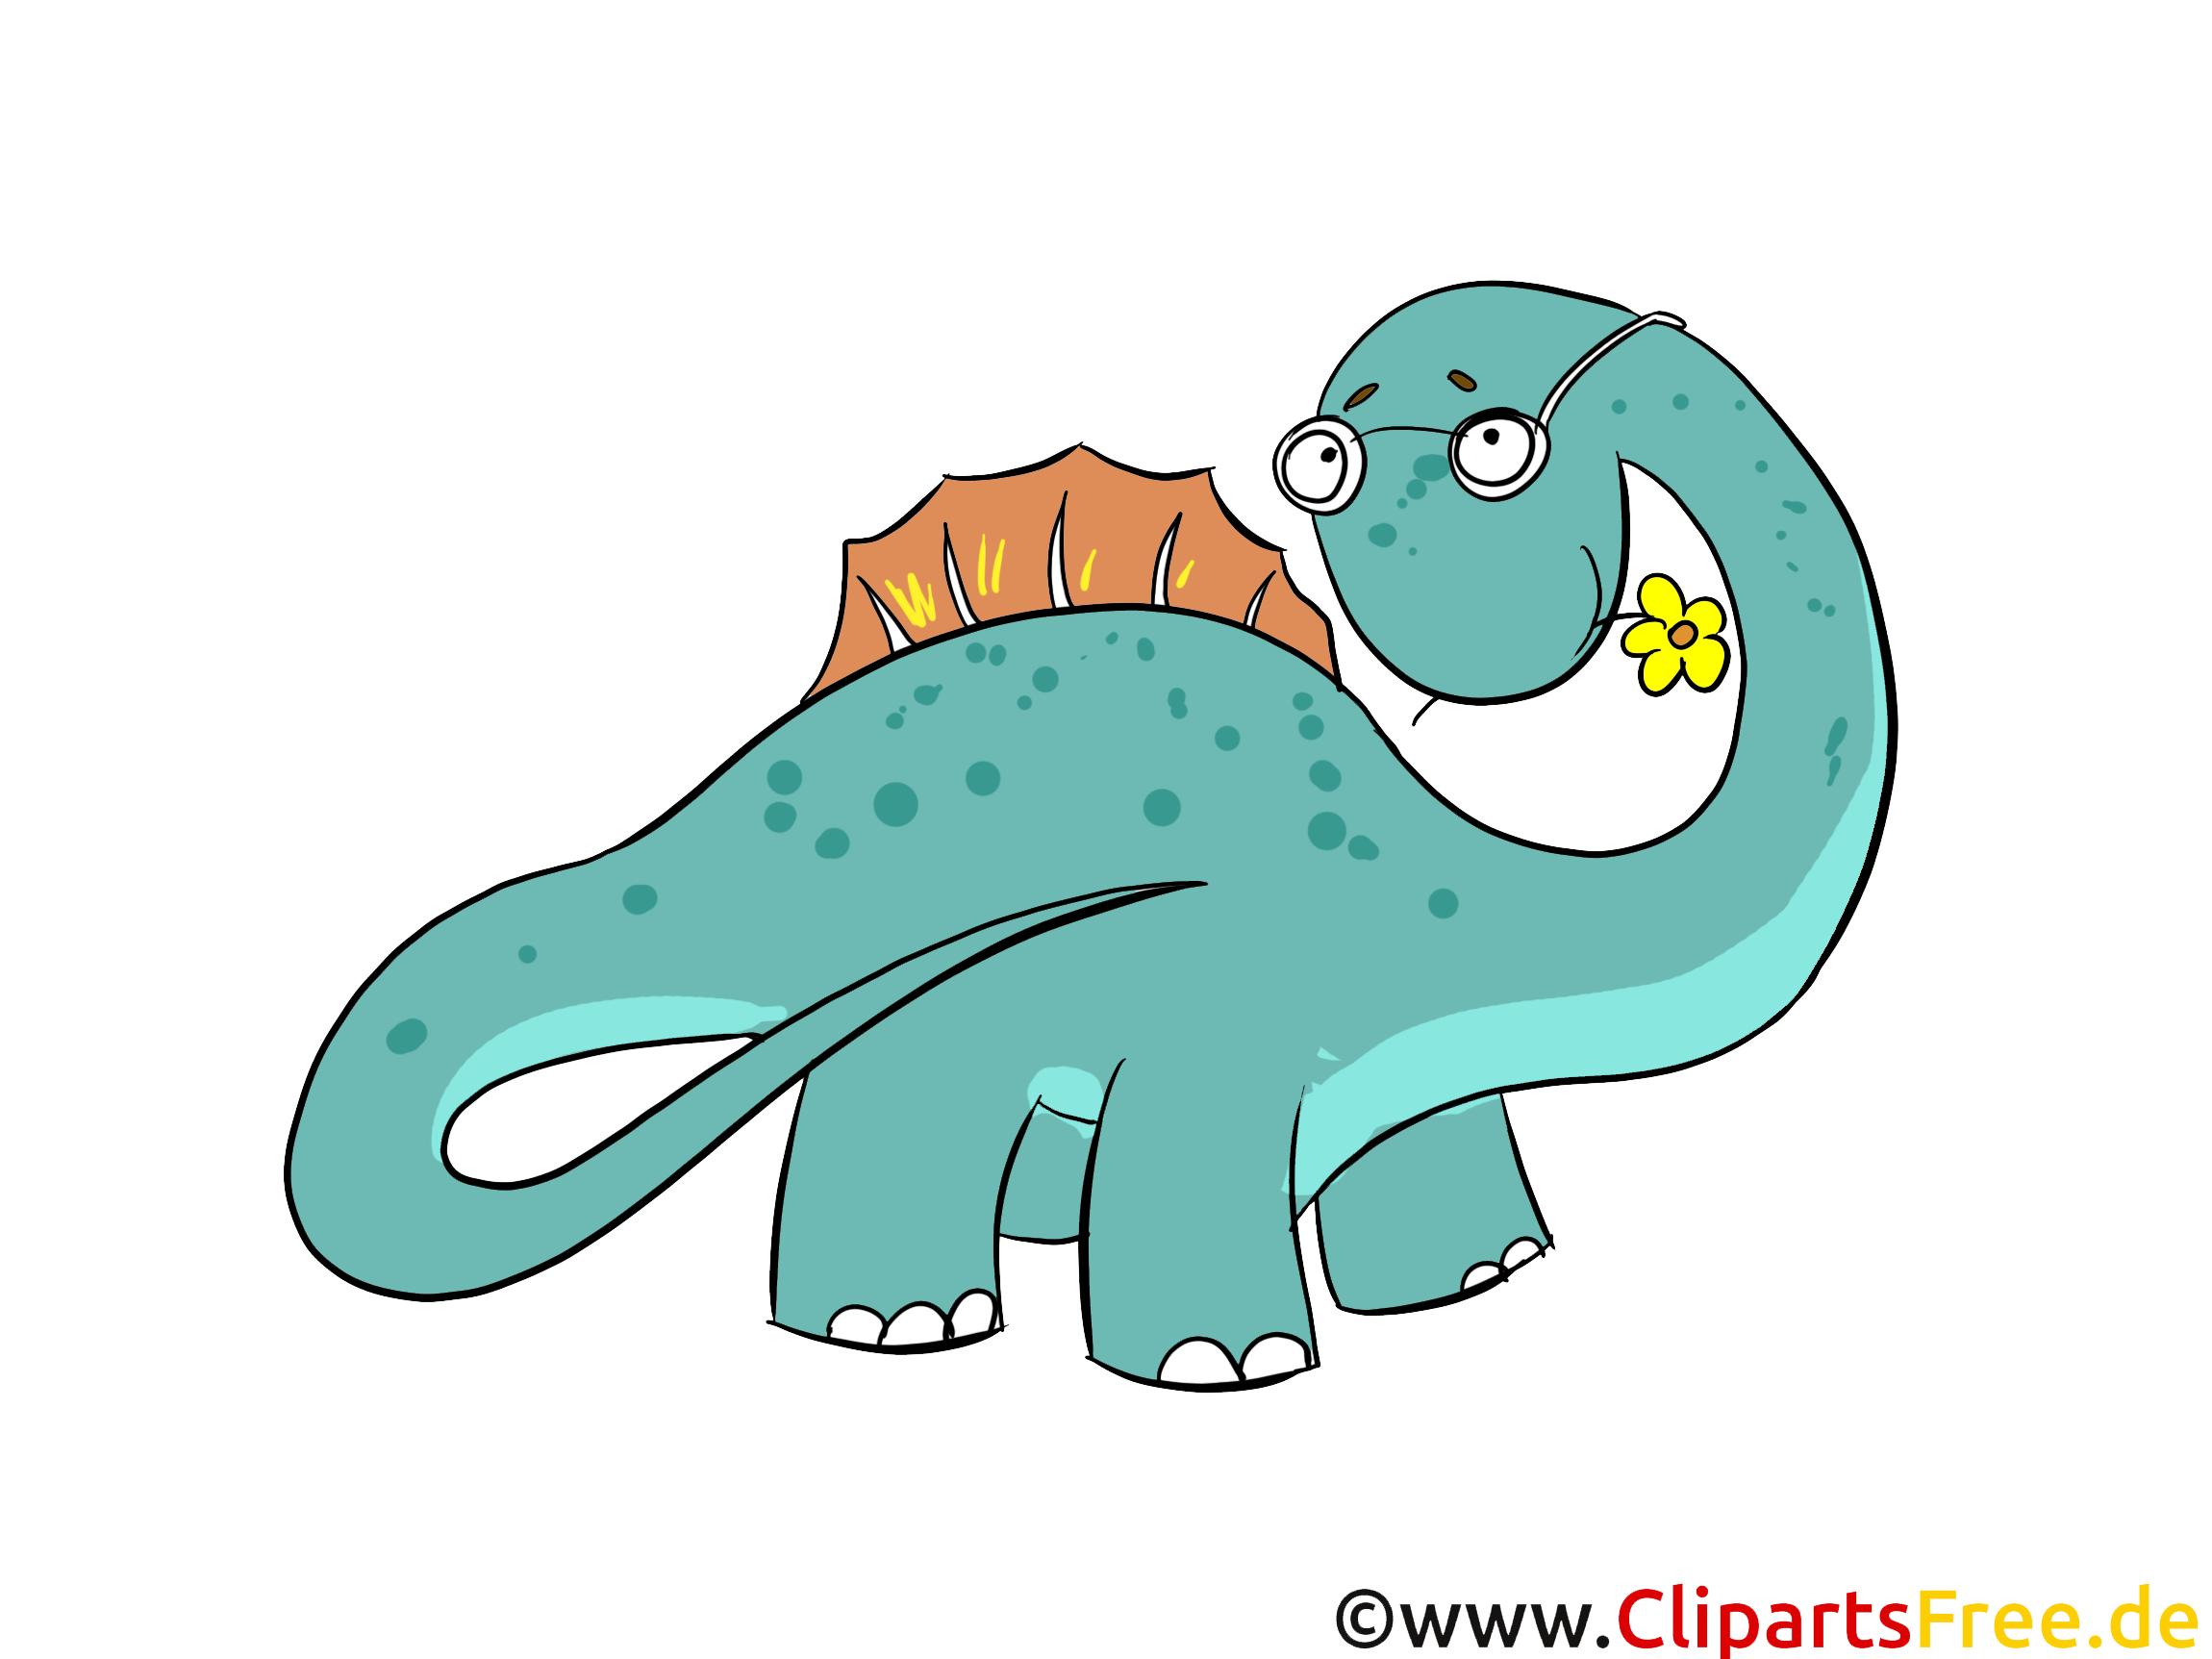 Cartoon Dino Image - Dinosaur images, cartoons, free illustrations